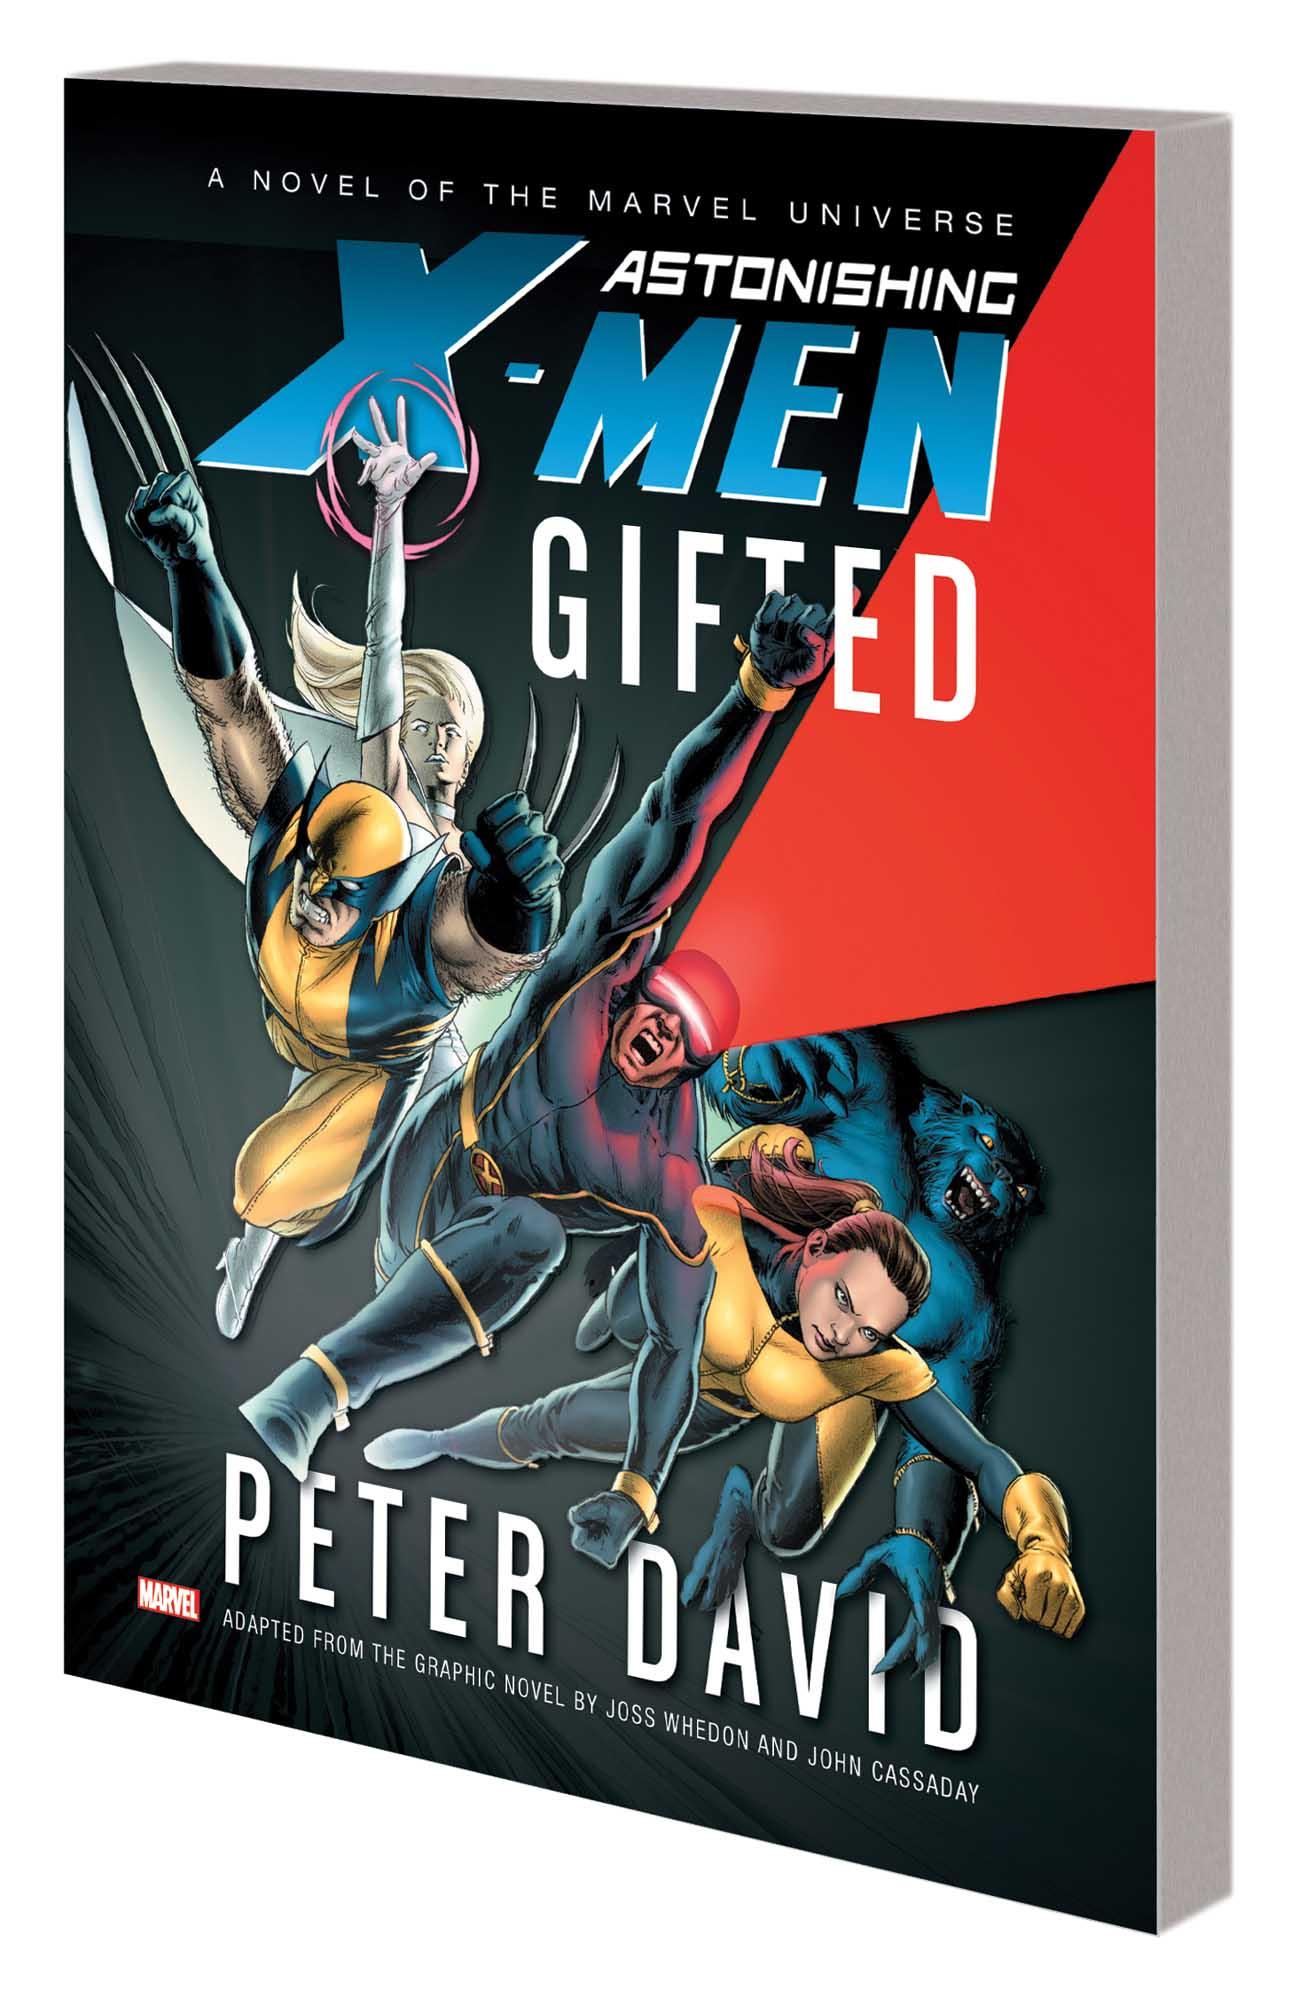 ASTONISHING X-MEN: GIFTED PROSE NOVEL MASS MARKET PAPERBACK (Trade Paperback)